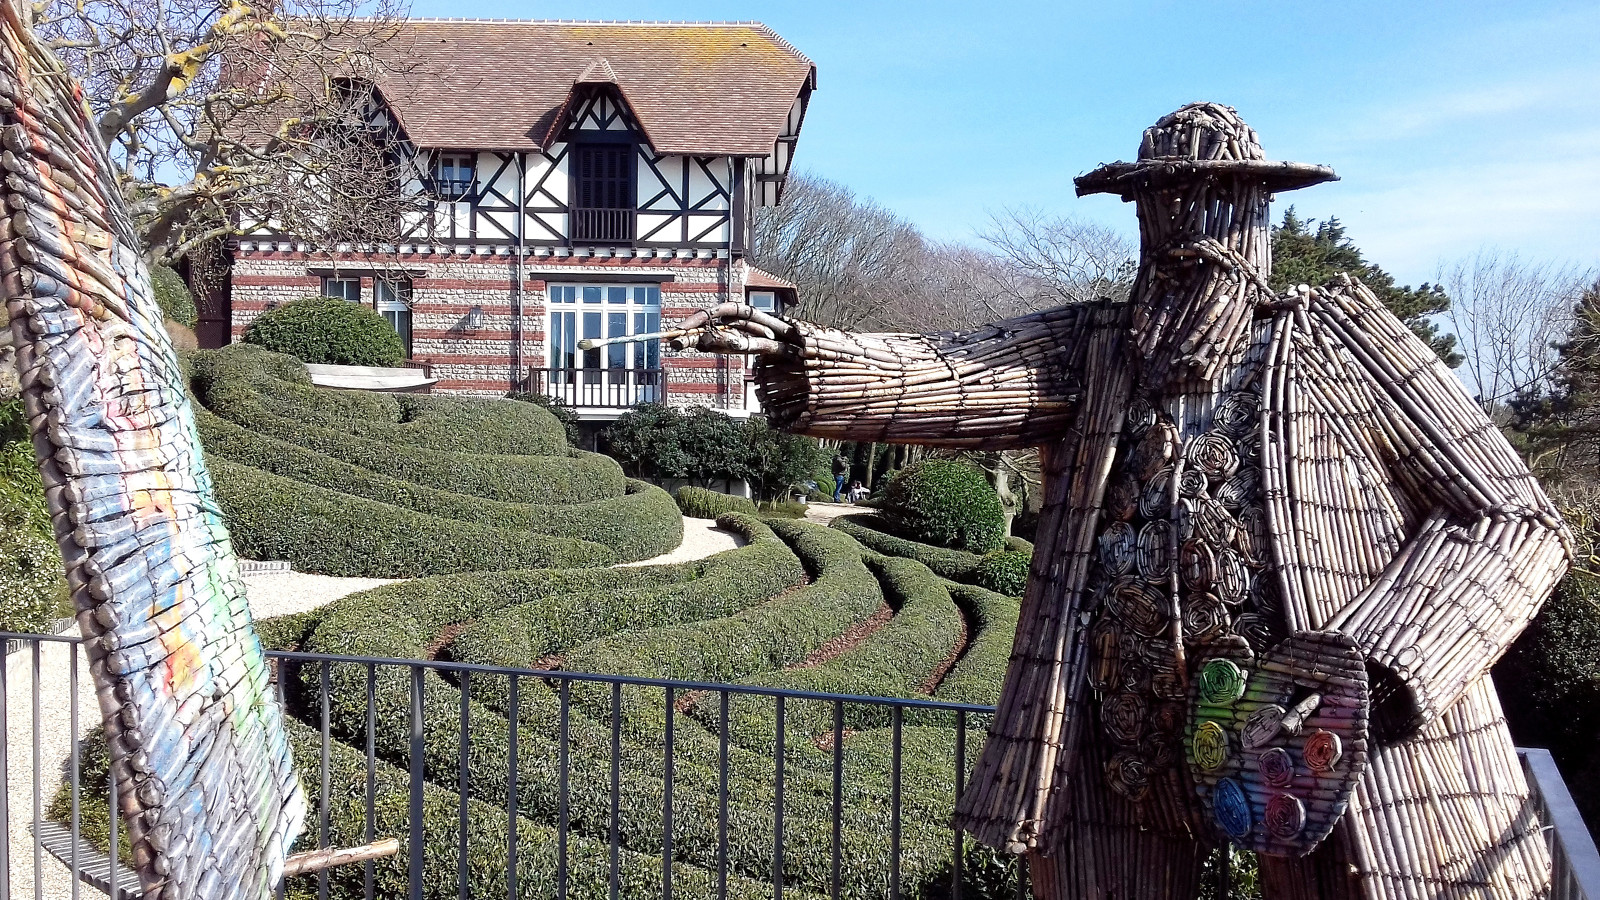 Jardins d'Étretat, hommage à Claude Monet, © Laetitia Peigner